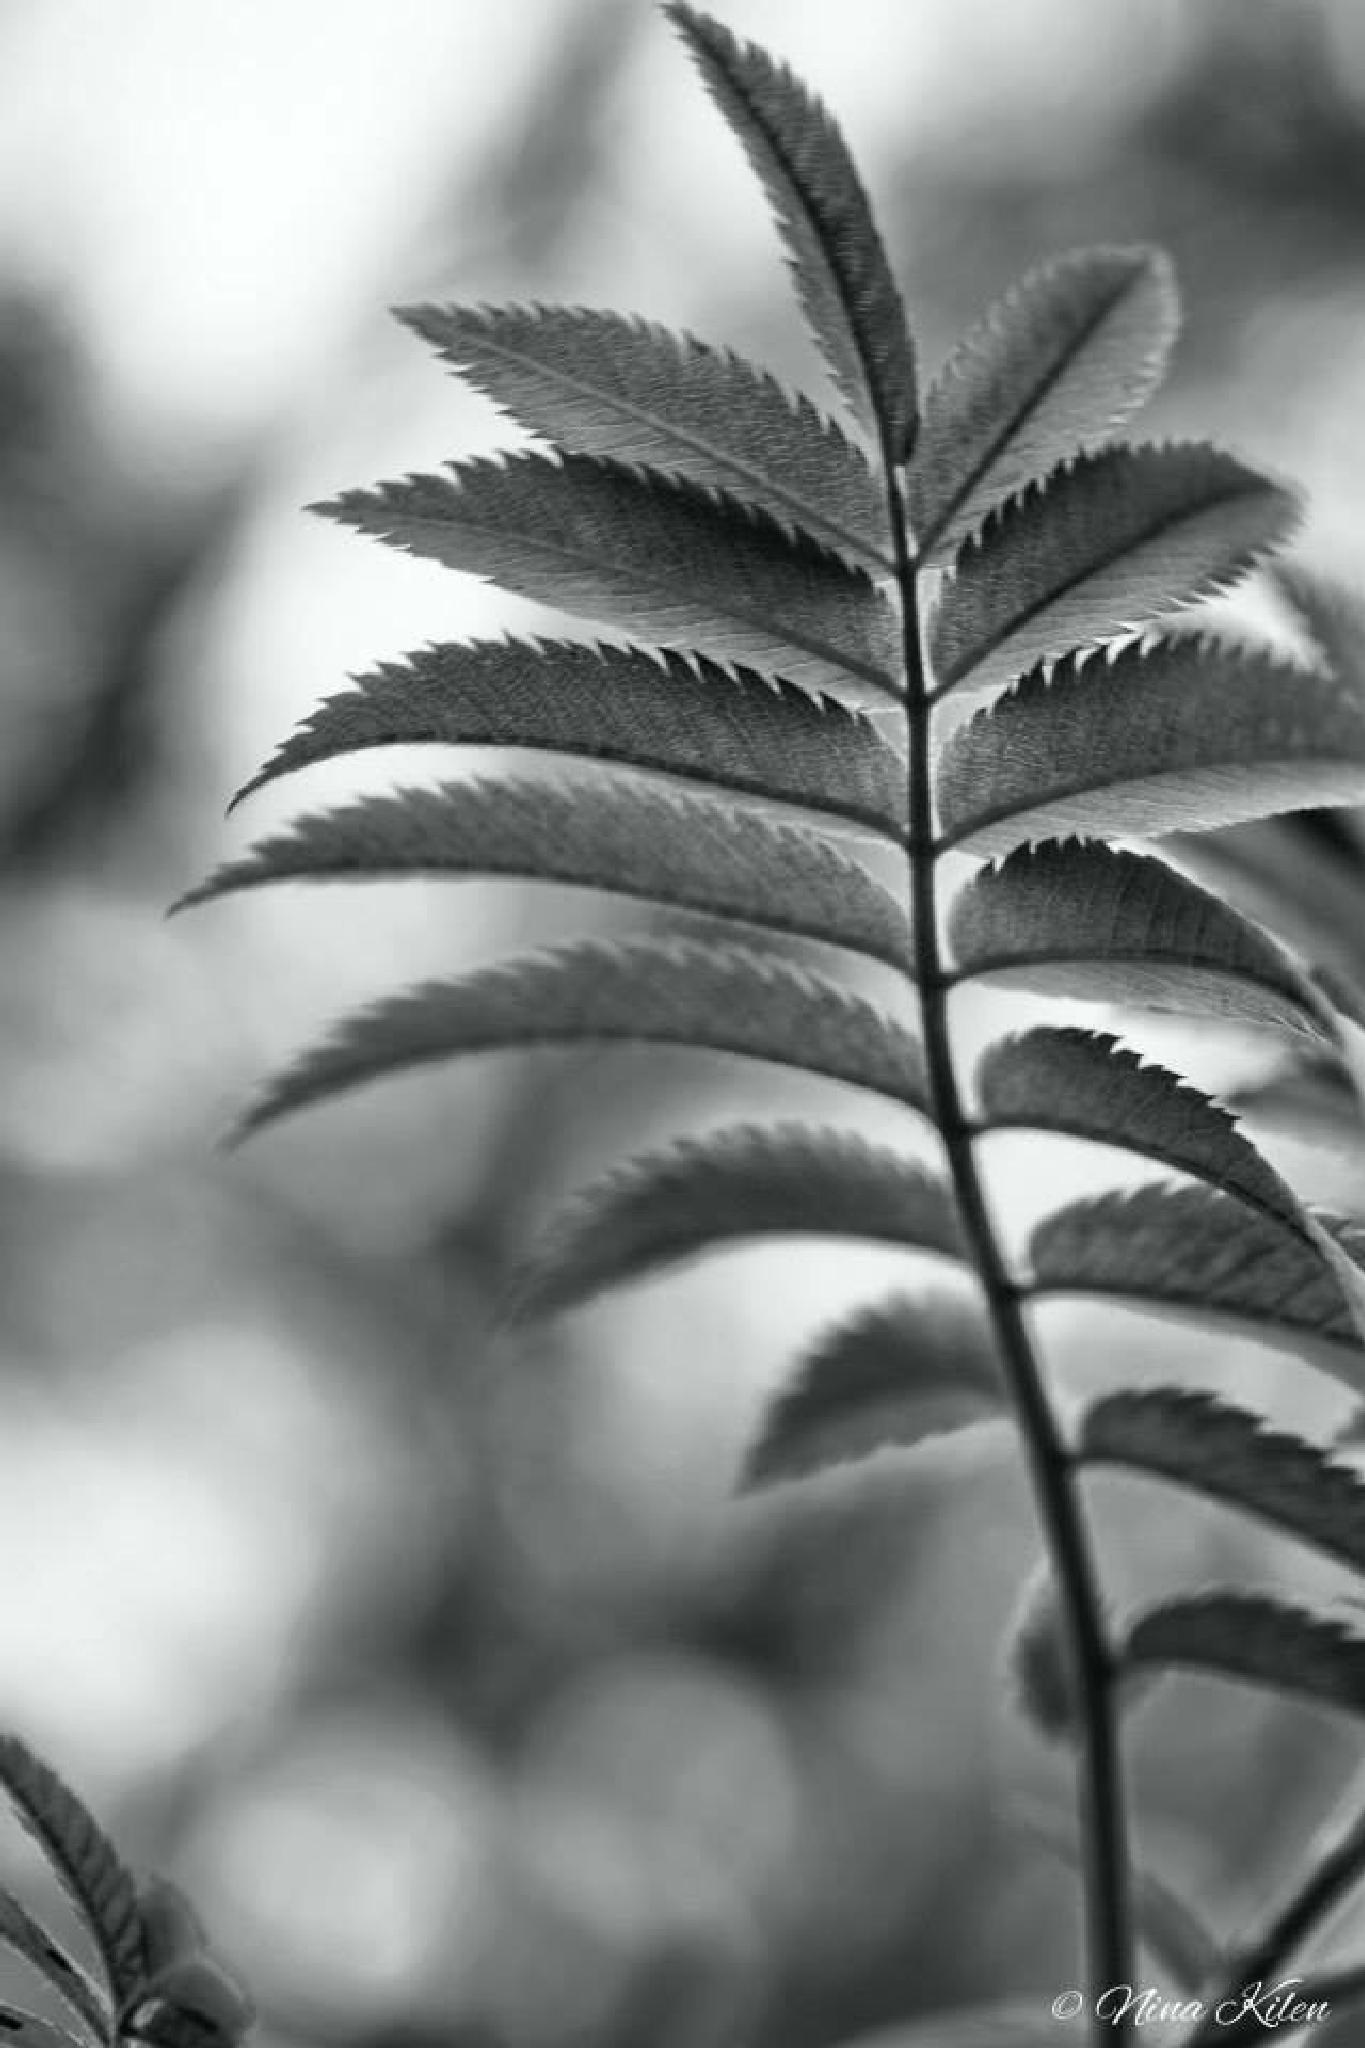 Leaf by nnordhavnkilen